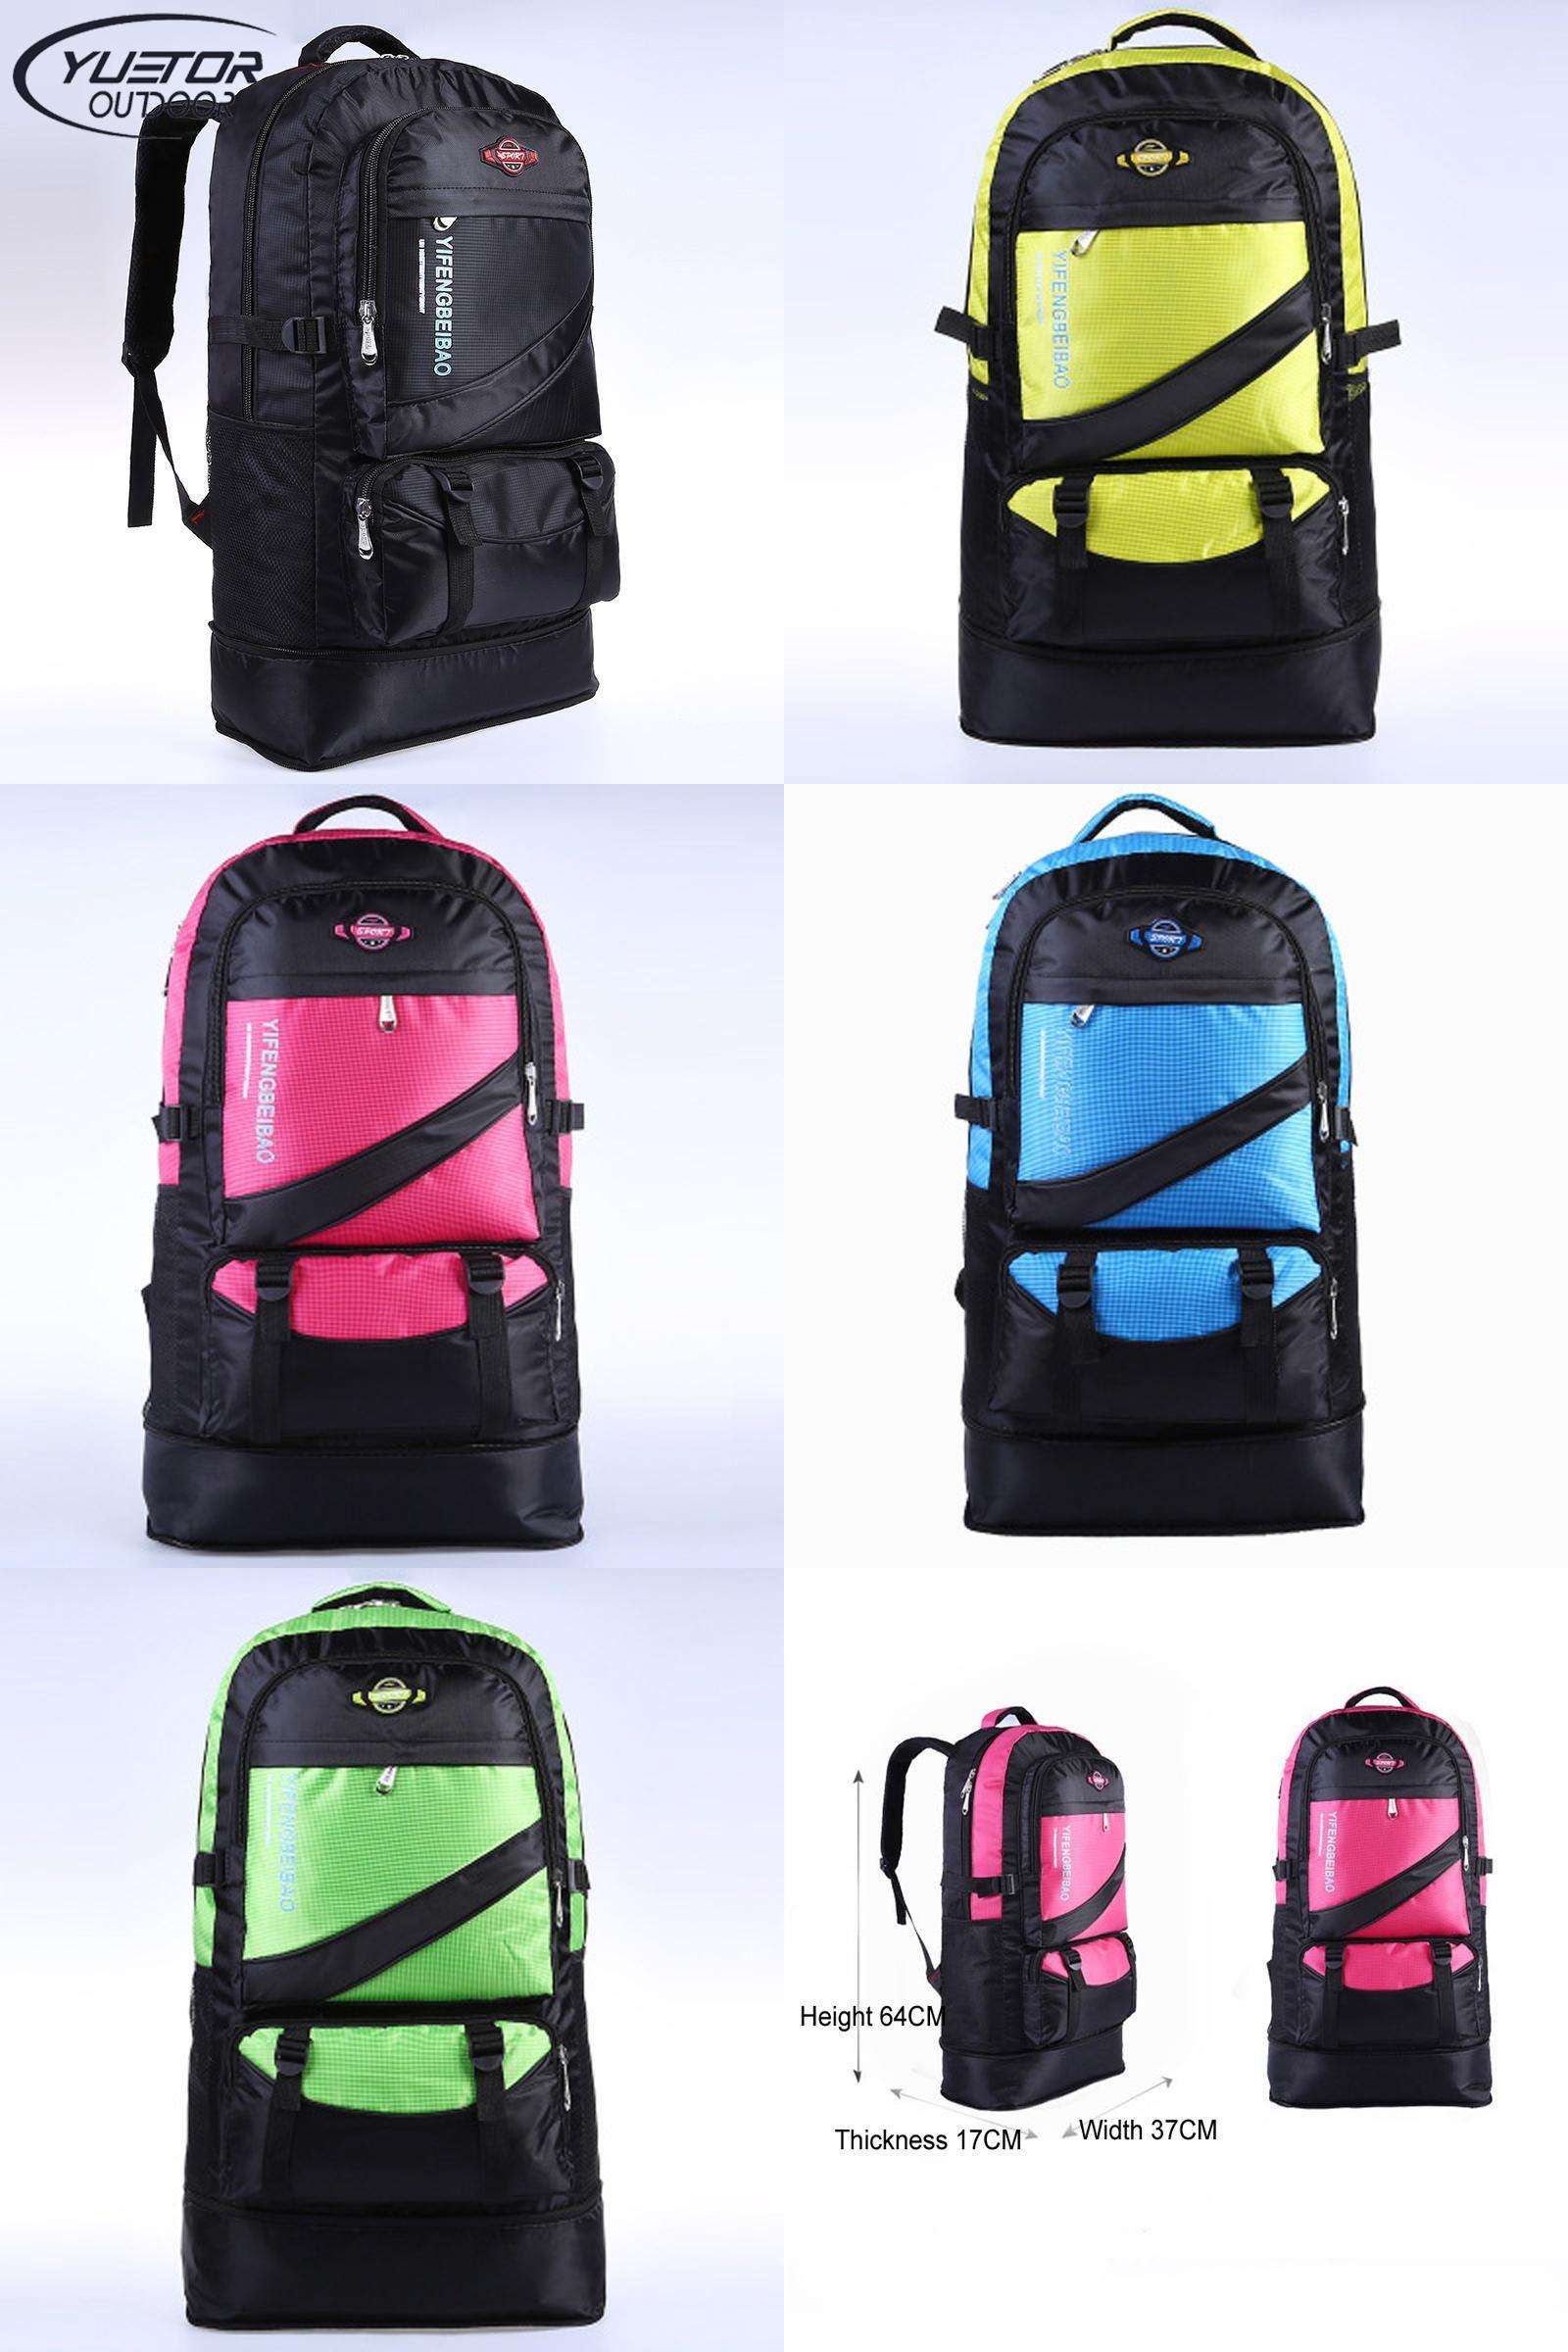 9294dbdd60  Visit to Buy  YUETOR 60L large waterproof outdoor hiking backpack camping  mochila travel rucksack